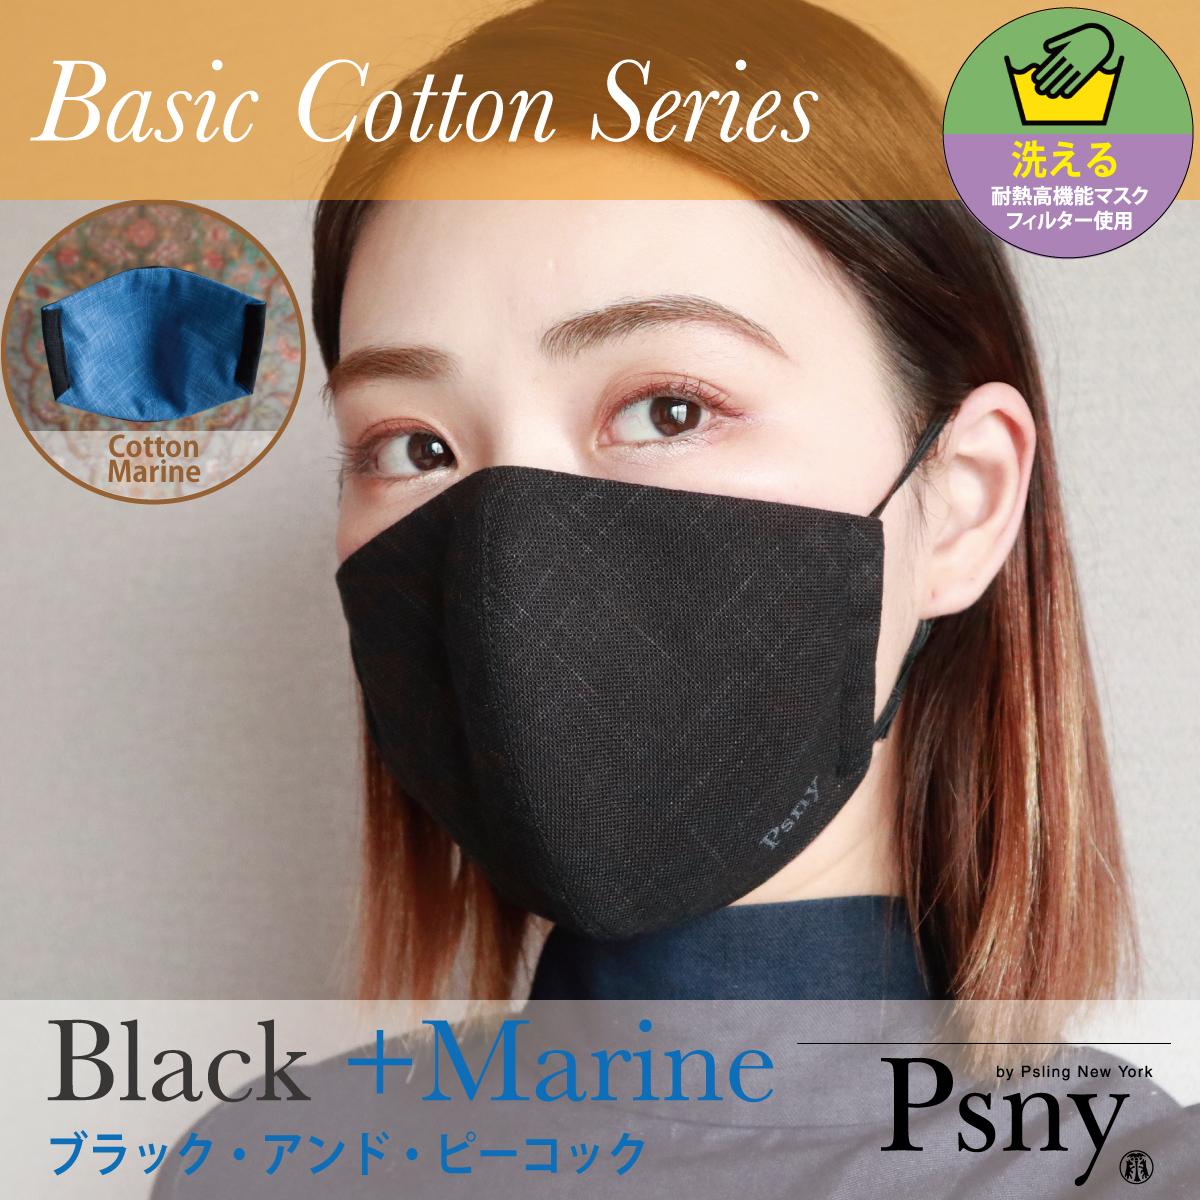 PSNY ベーシックコットン・ブラック(&マリン) 花粉 黄砂 洗えるフィルター入り 立体 マスク 大人用